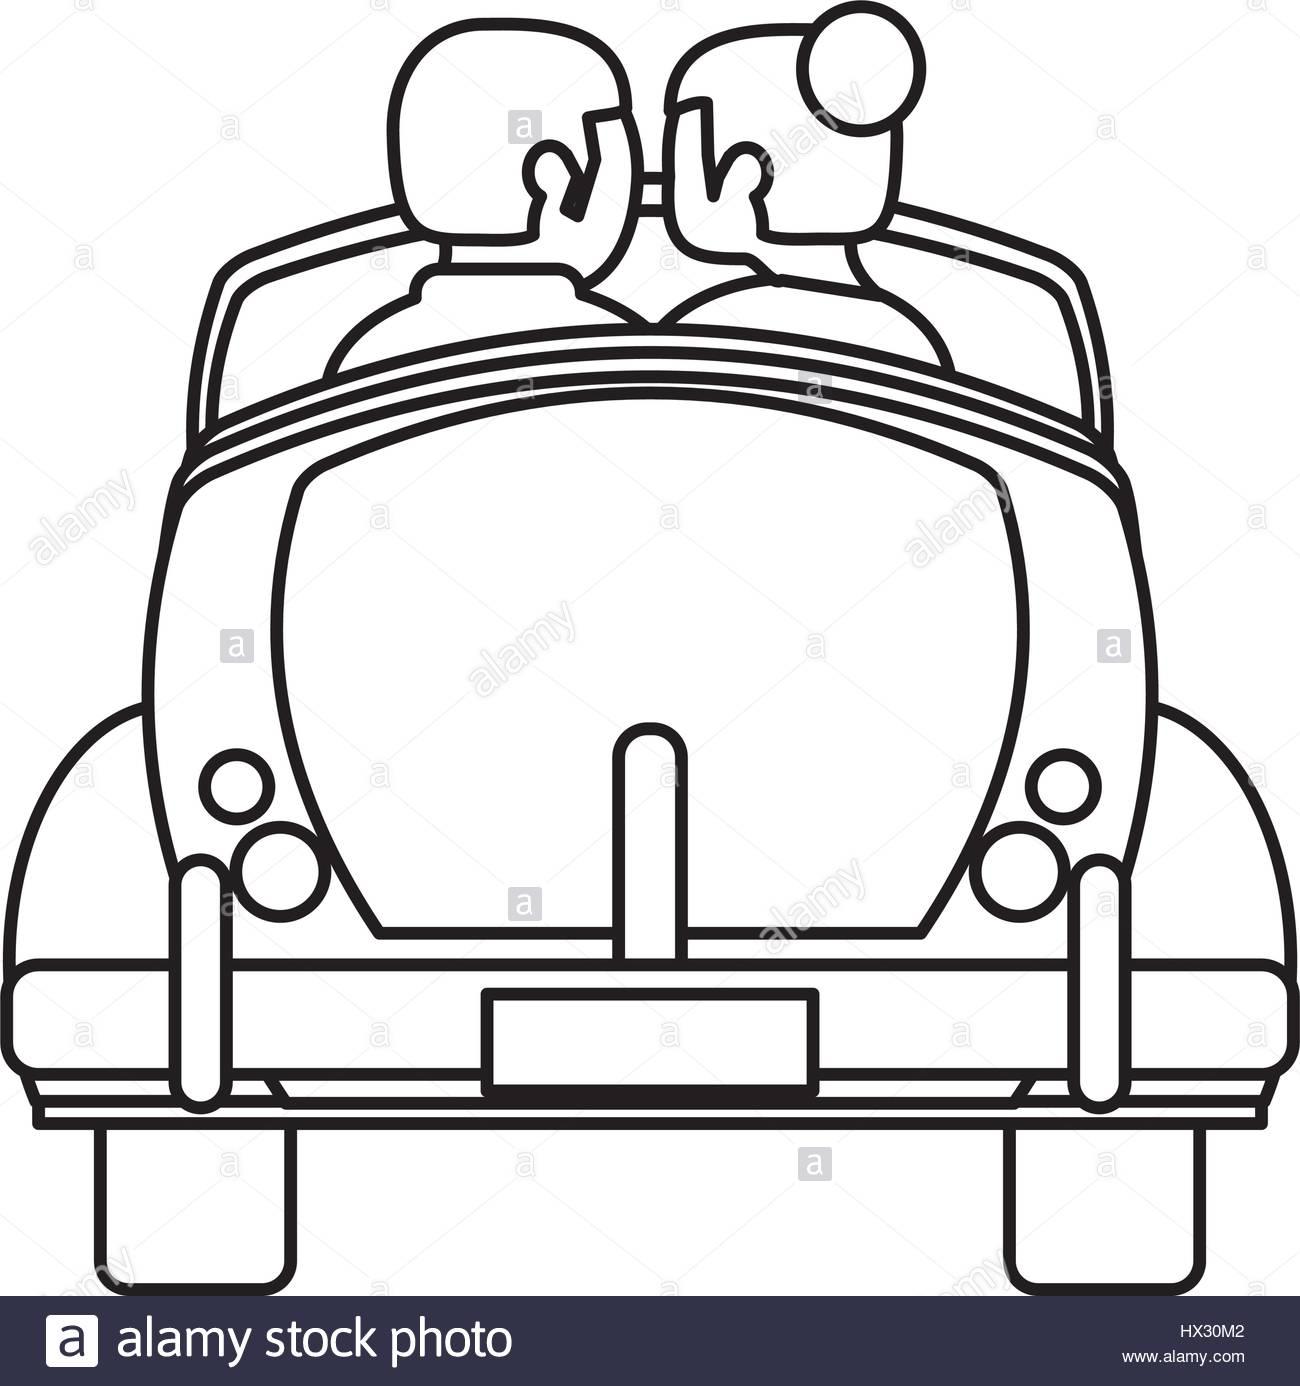 1300x1386 Couple Car Honeymoon Travel Outline Stock Vector Art